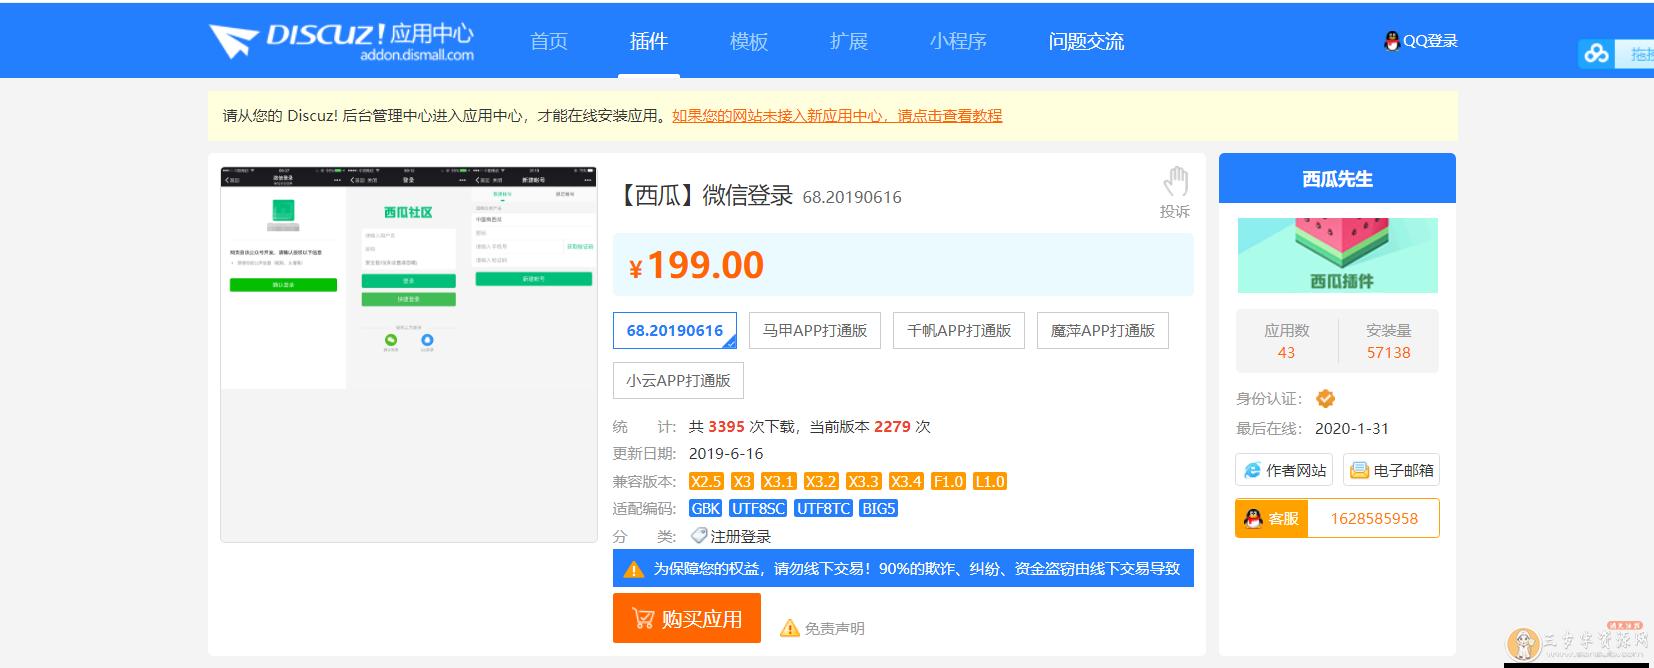 Discuz微信登录插件,西瓜微信登录68.20190616版(xigua_login),价值199元